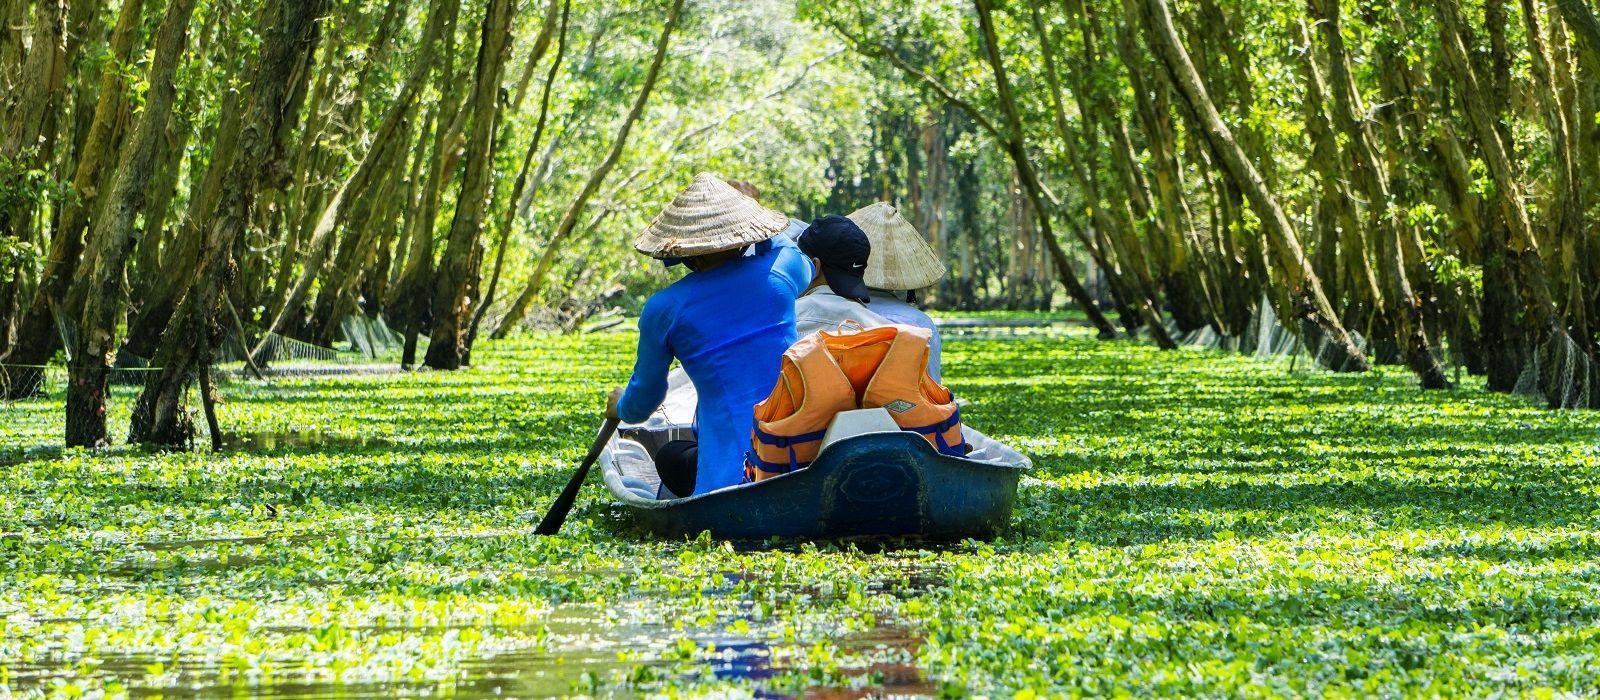 Vietnam Hautnah: Von Hanoi nach Saigon Urlaub 2